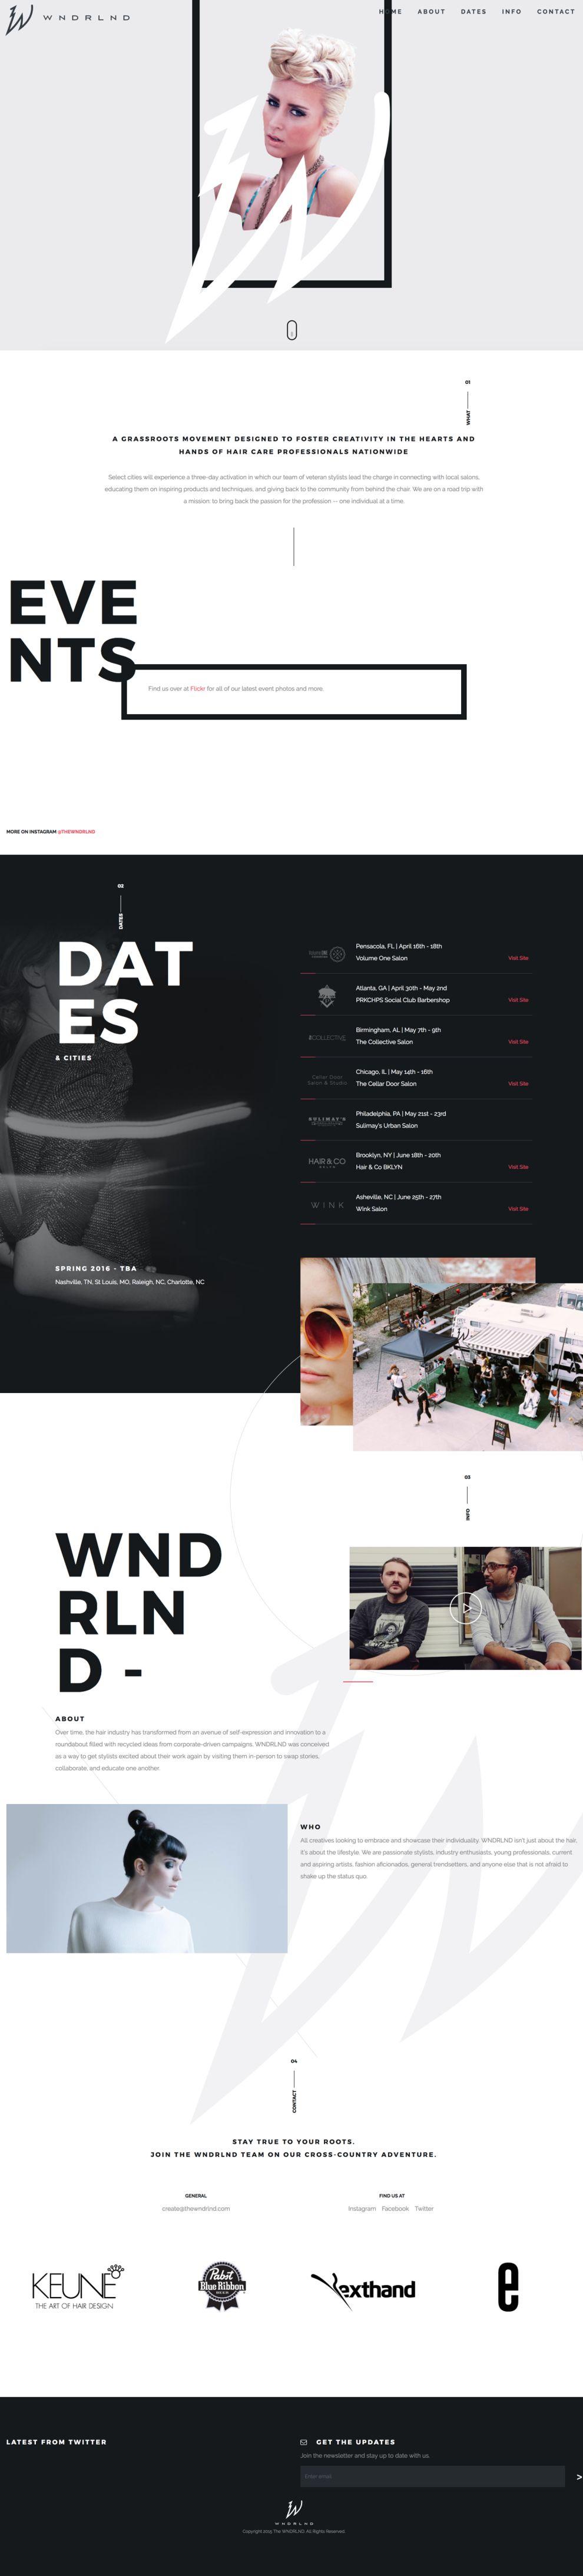 WNDRLND Gorgeous Website Design